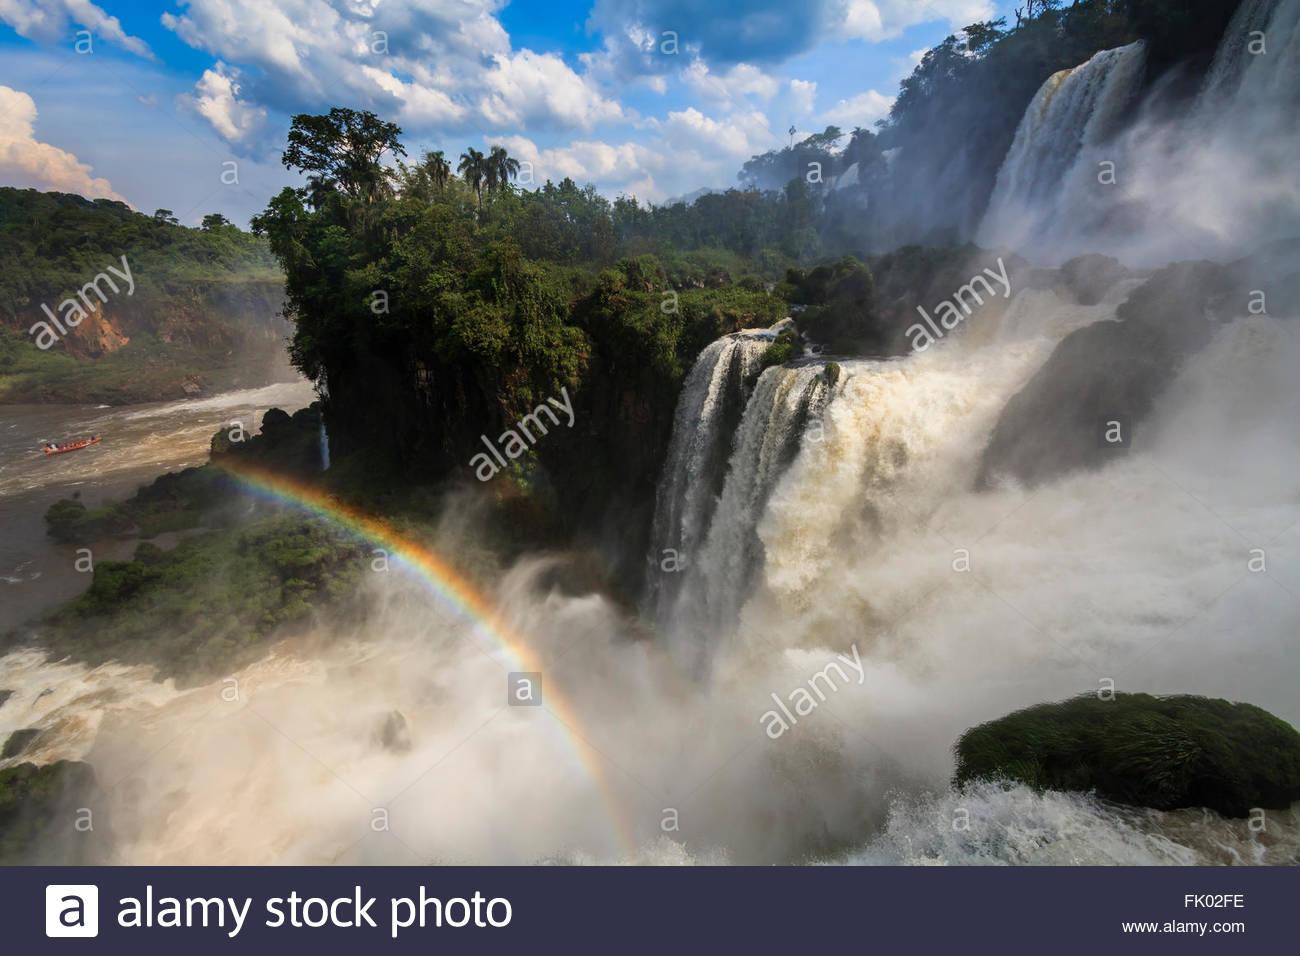 Amazing view of the Iguazu Falls and rainbow. Argentina. - Stock Image